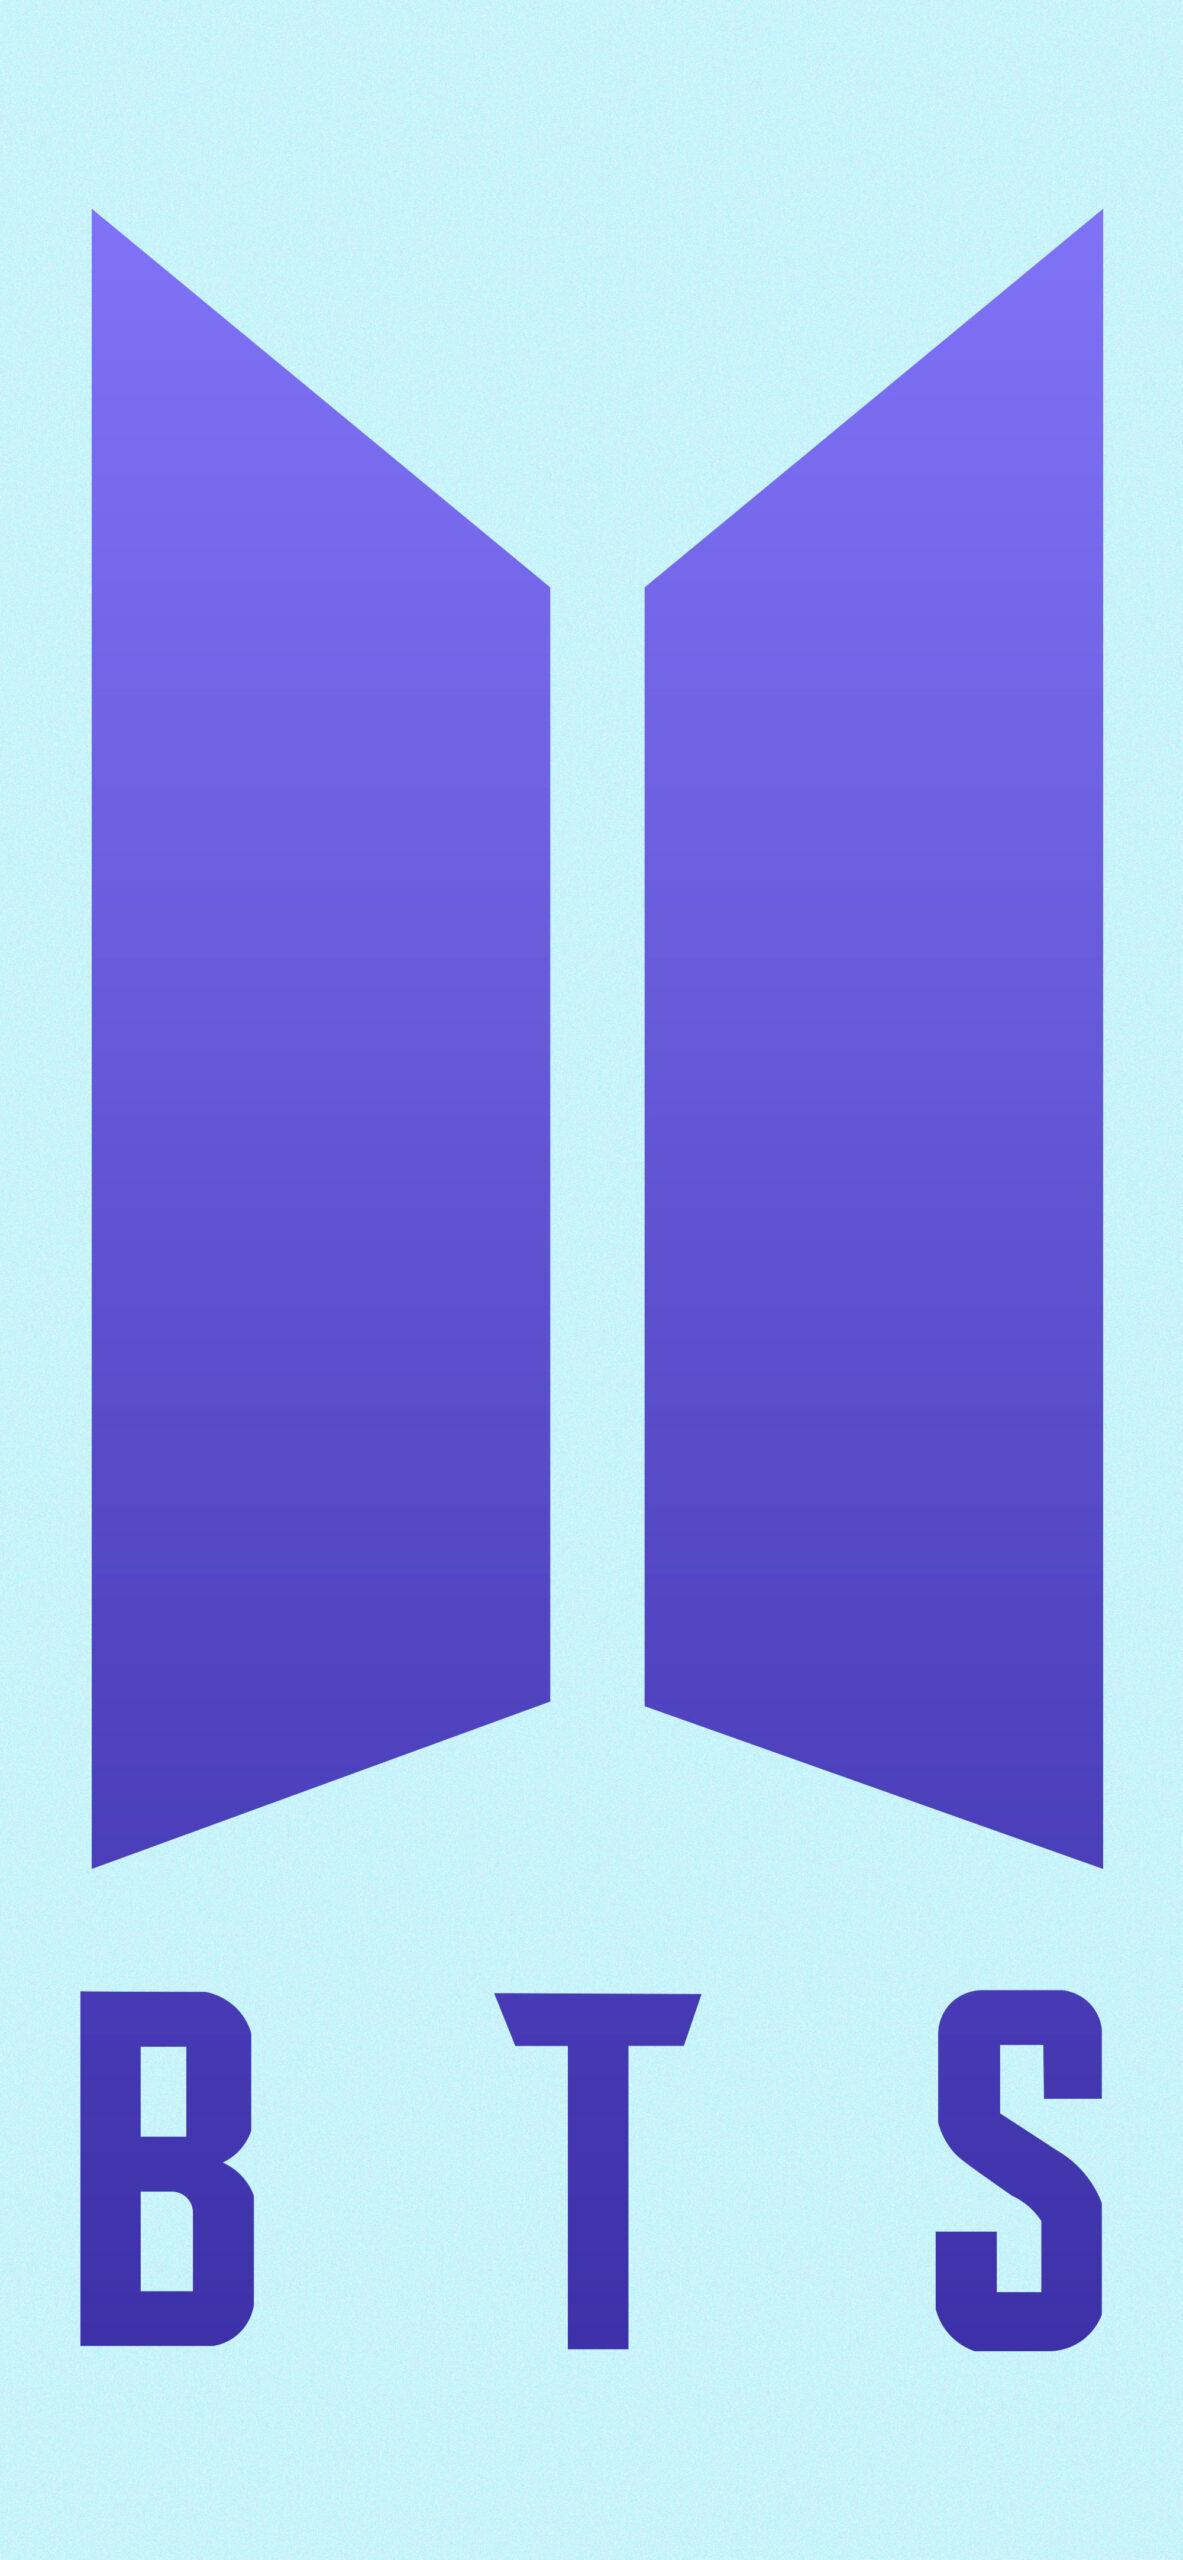 bts bt21 koya blue background